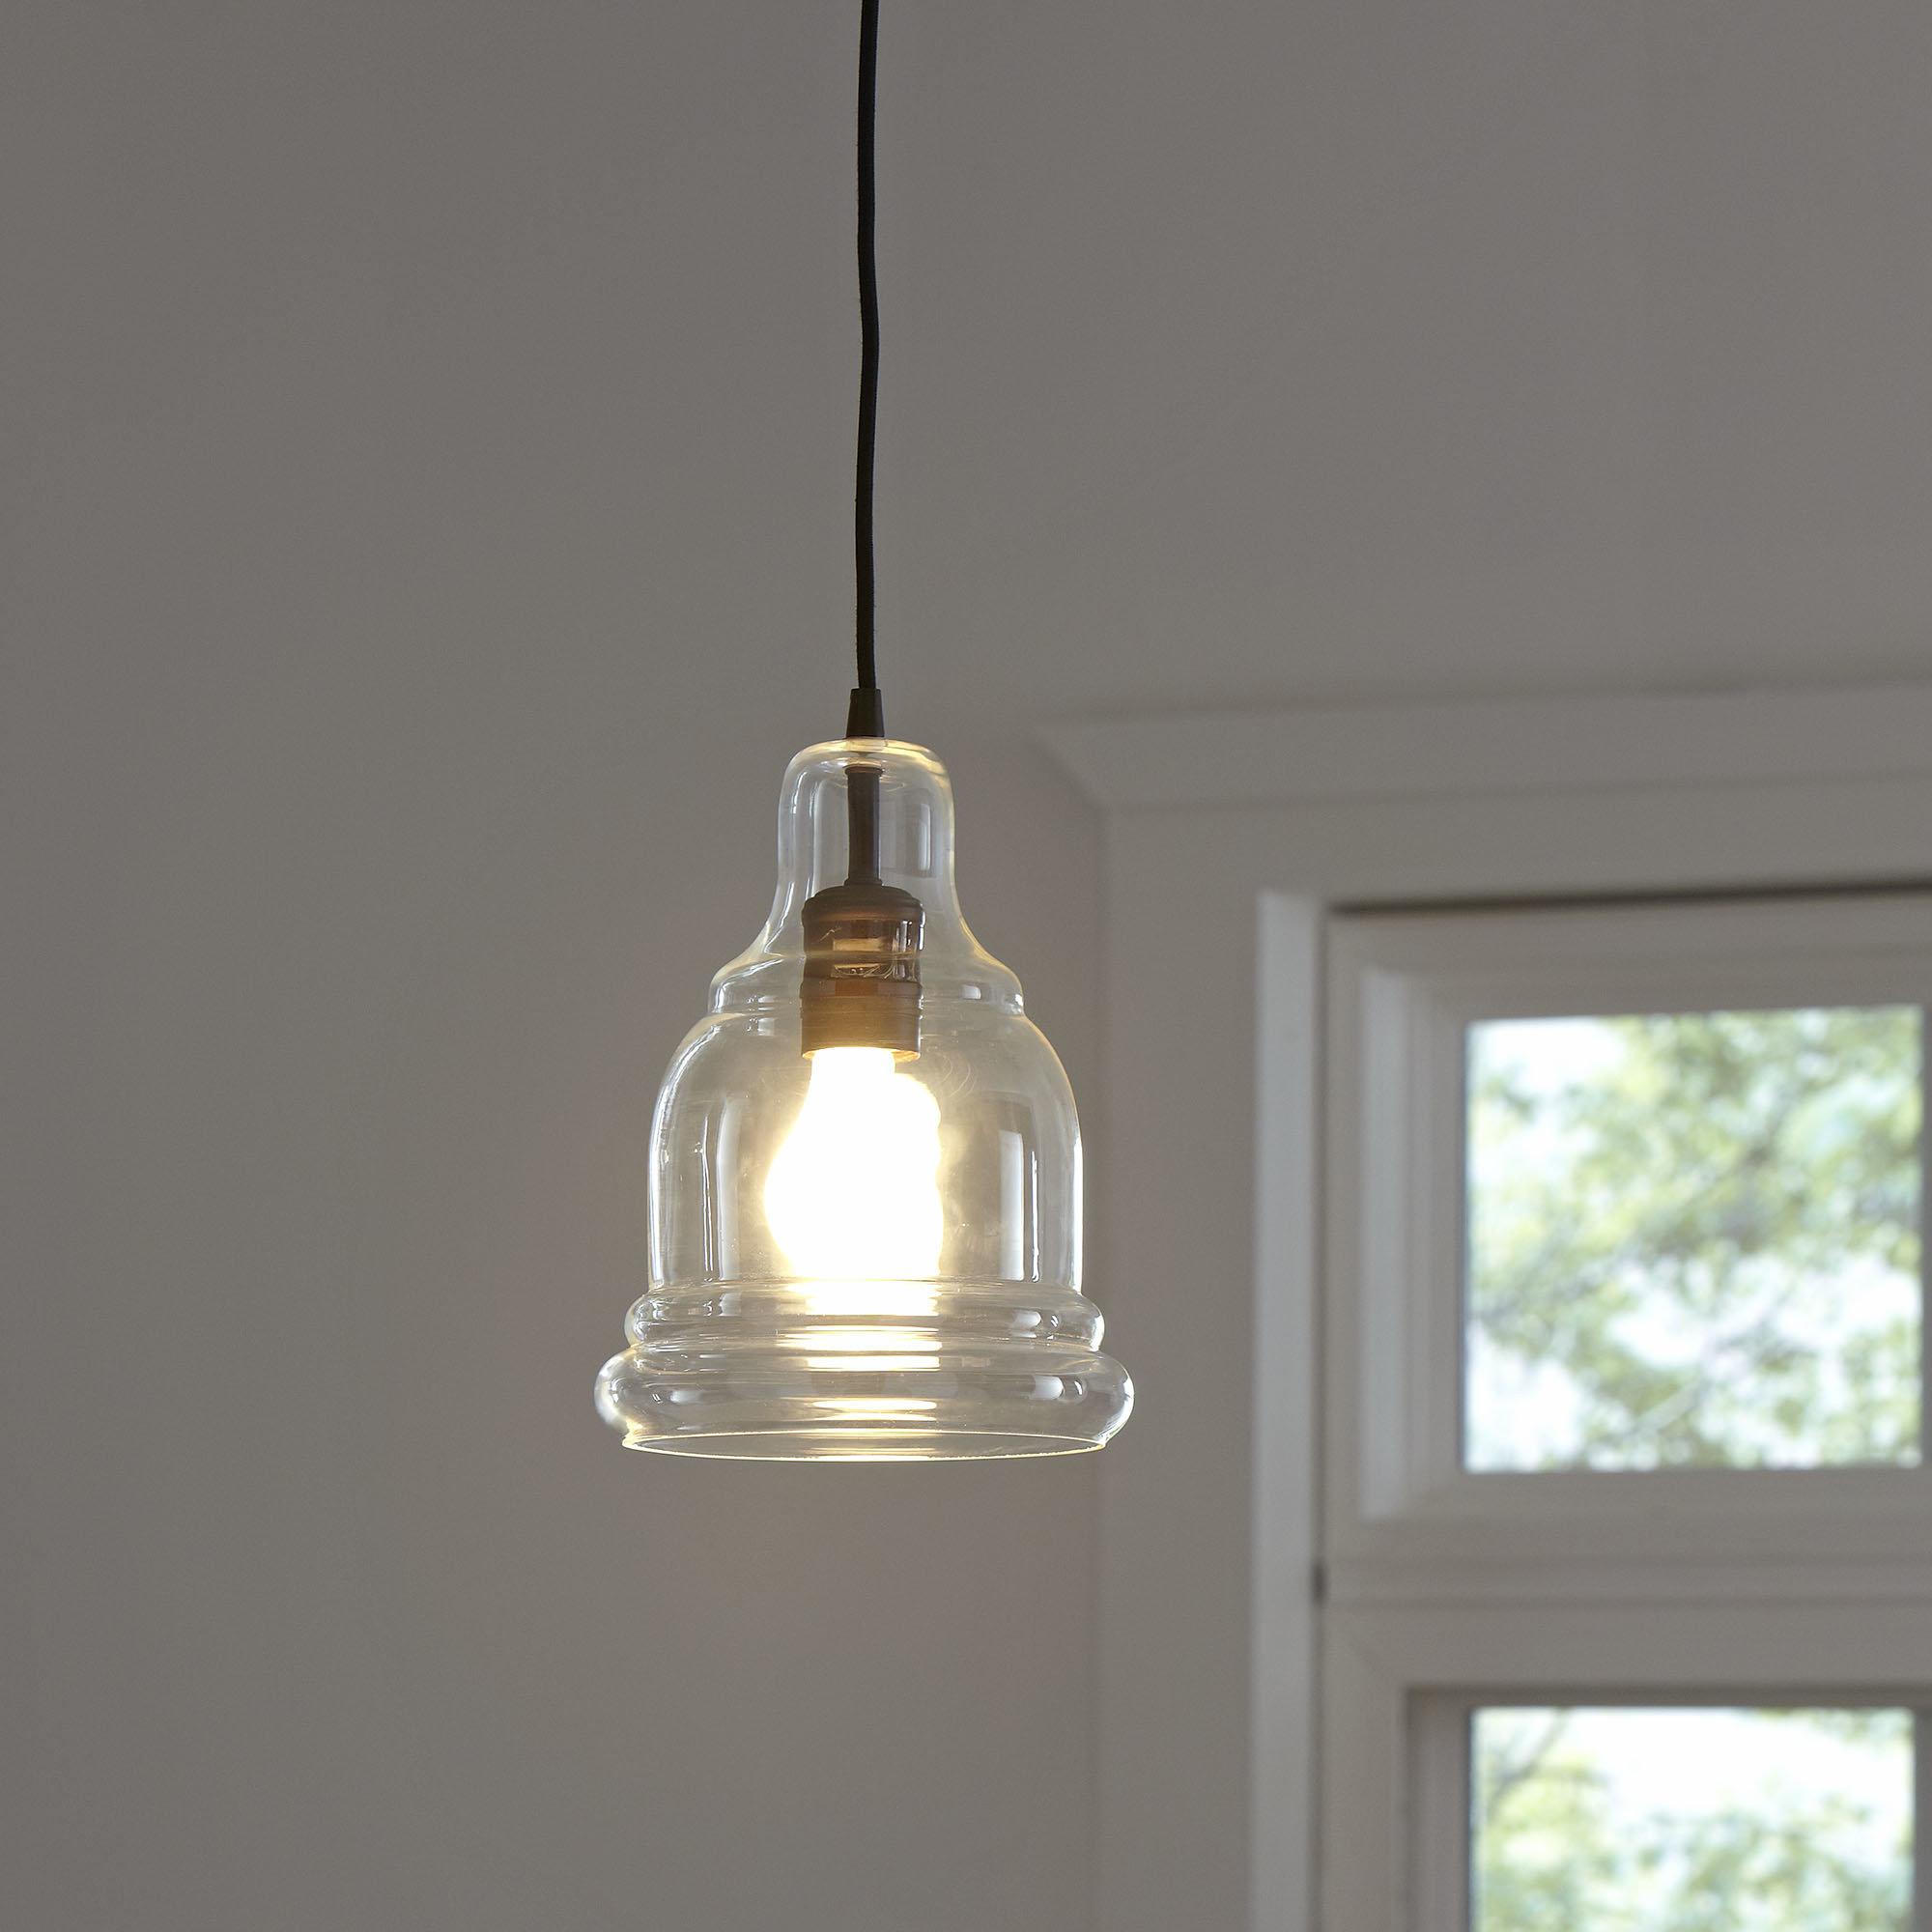 Vintage Edison 1 Light Bowl Pendants In Well Known Rafaello Edison 1 Light Bell Pendant (Gallery 14 of 25)